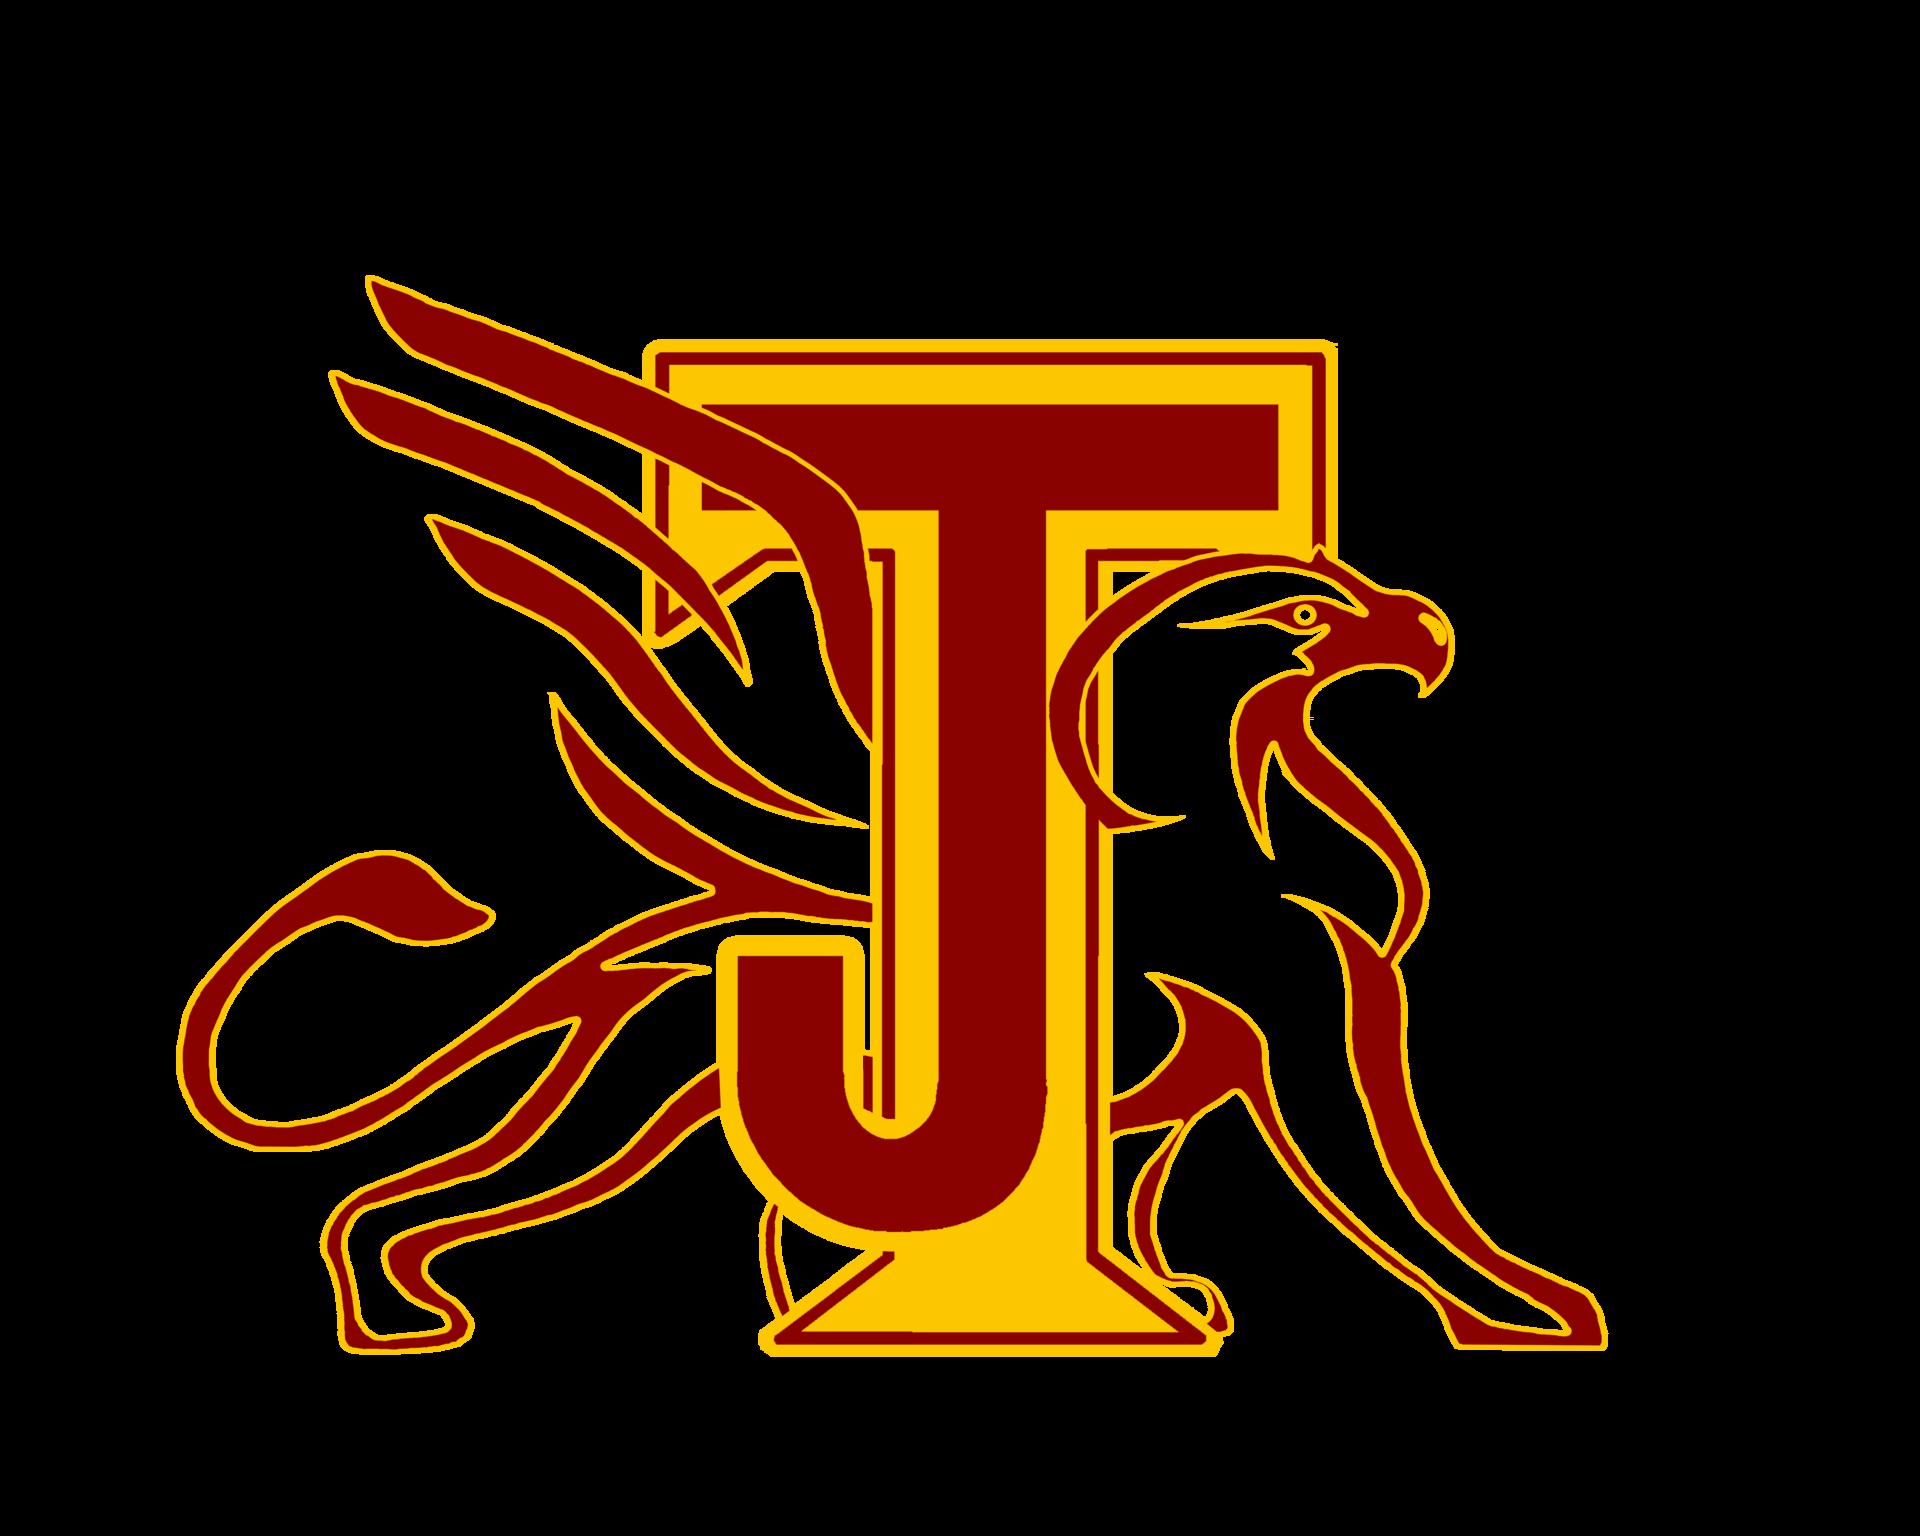 TJCA athletic logo